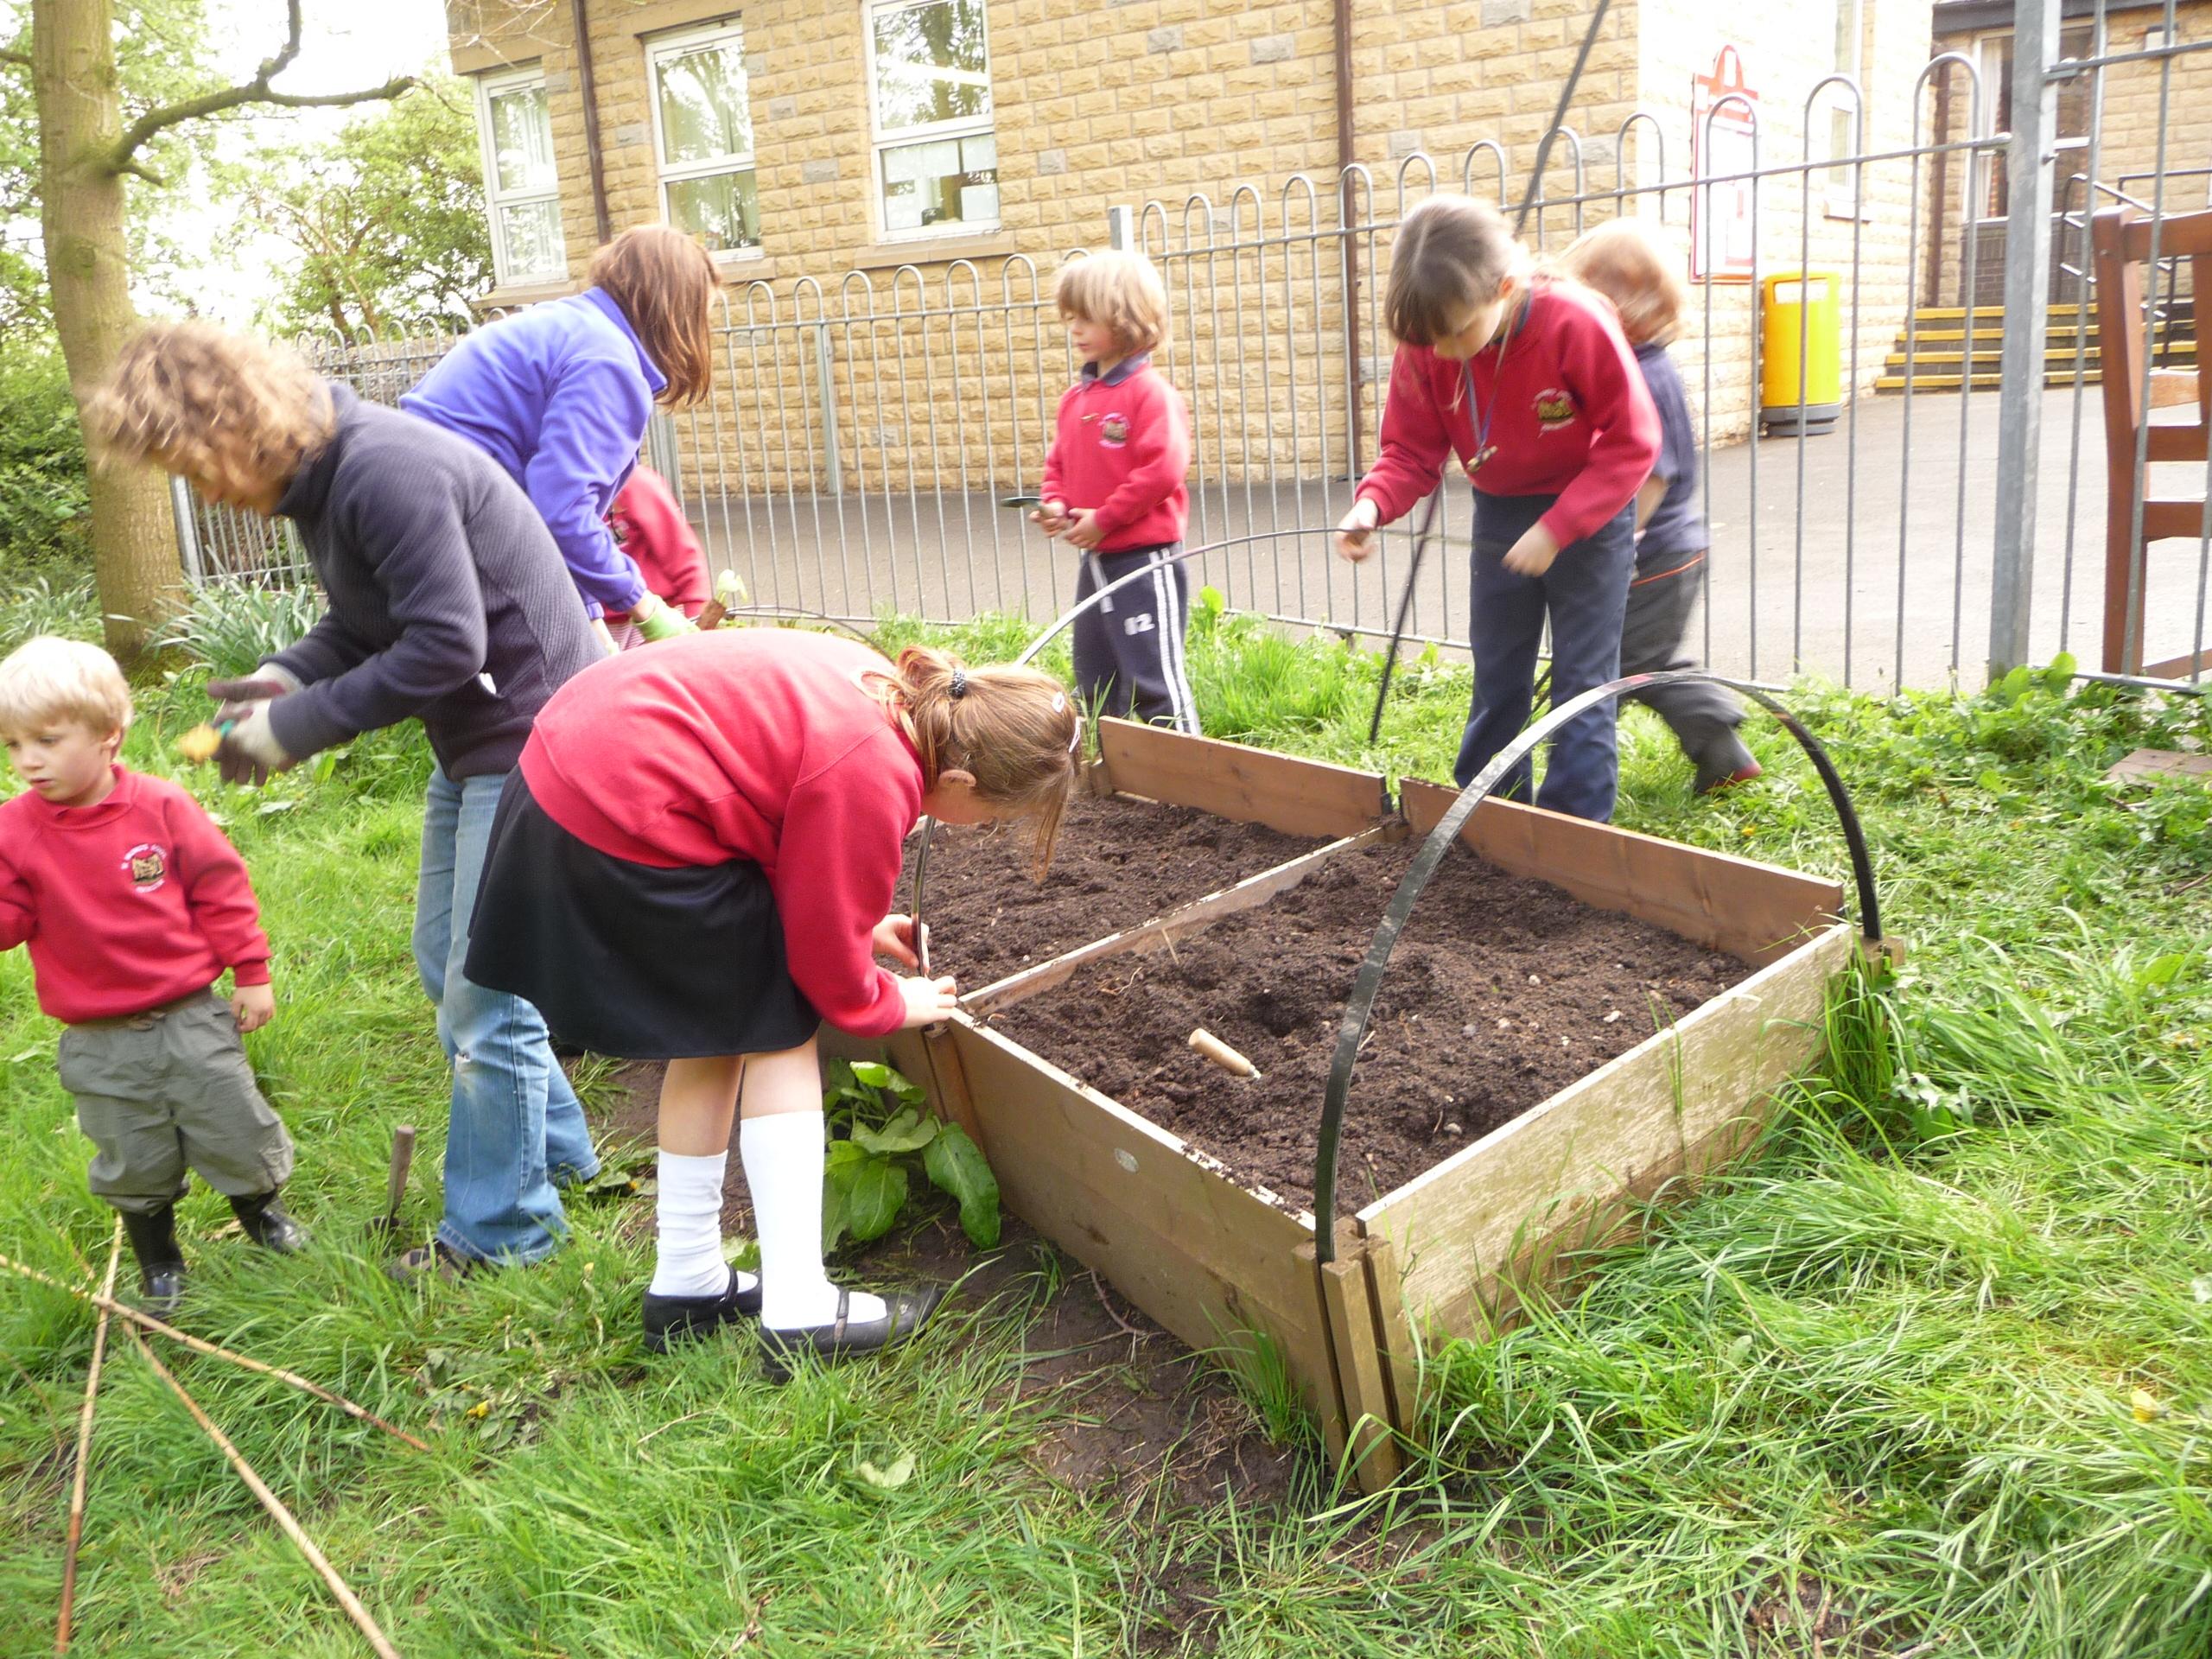 Setting up a garden for children gardening with children for Gardening with children